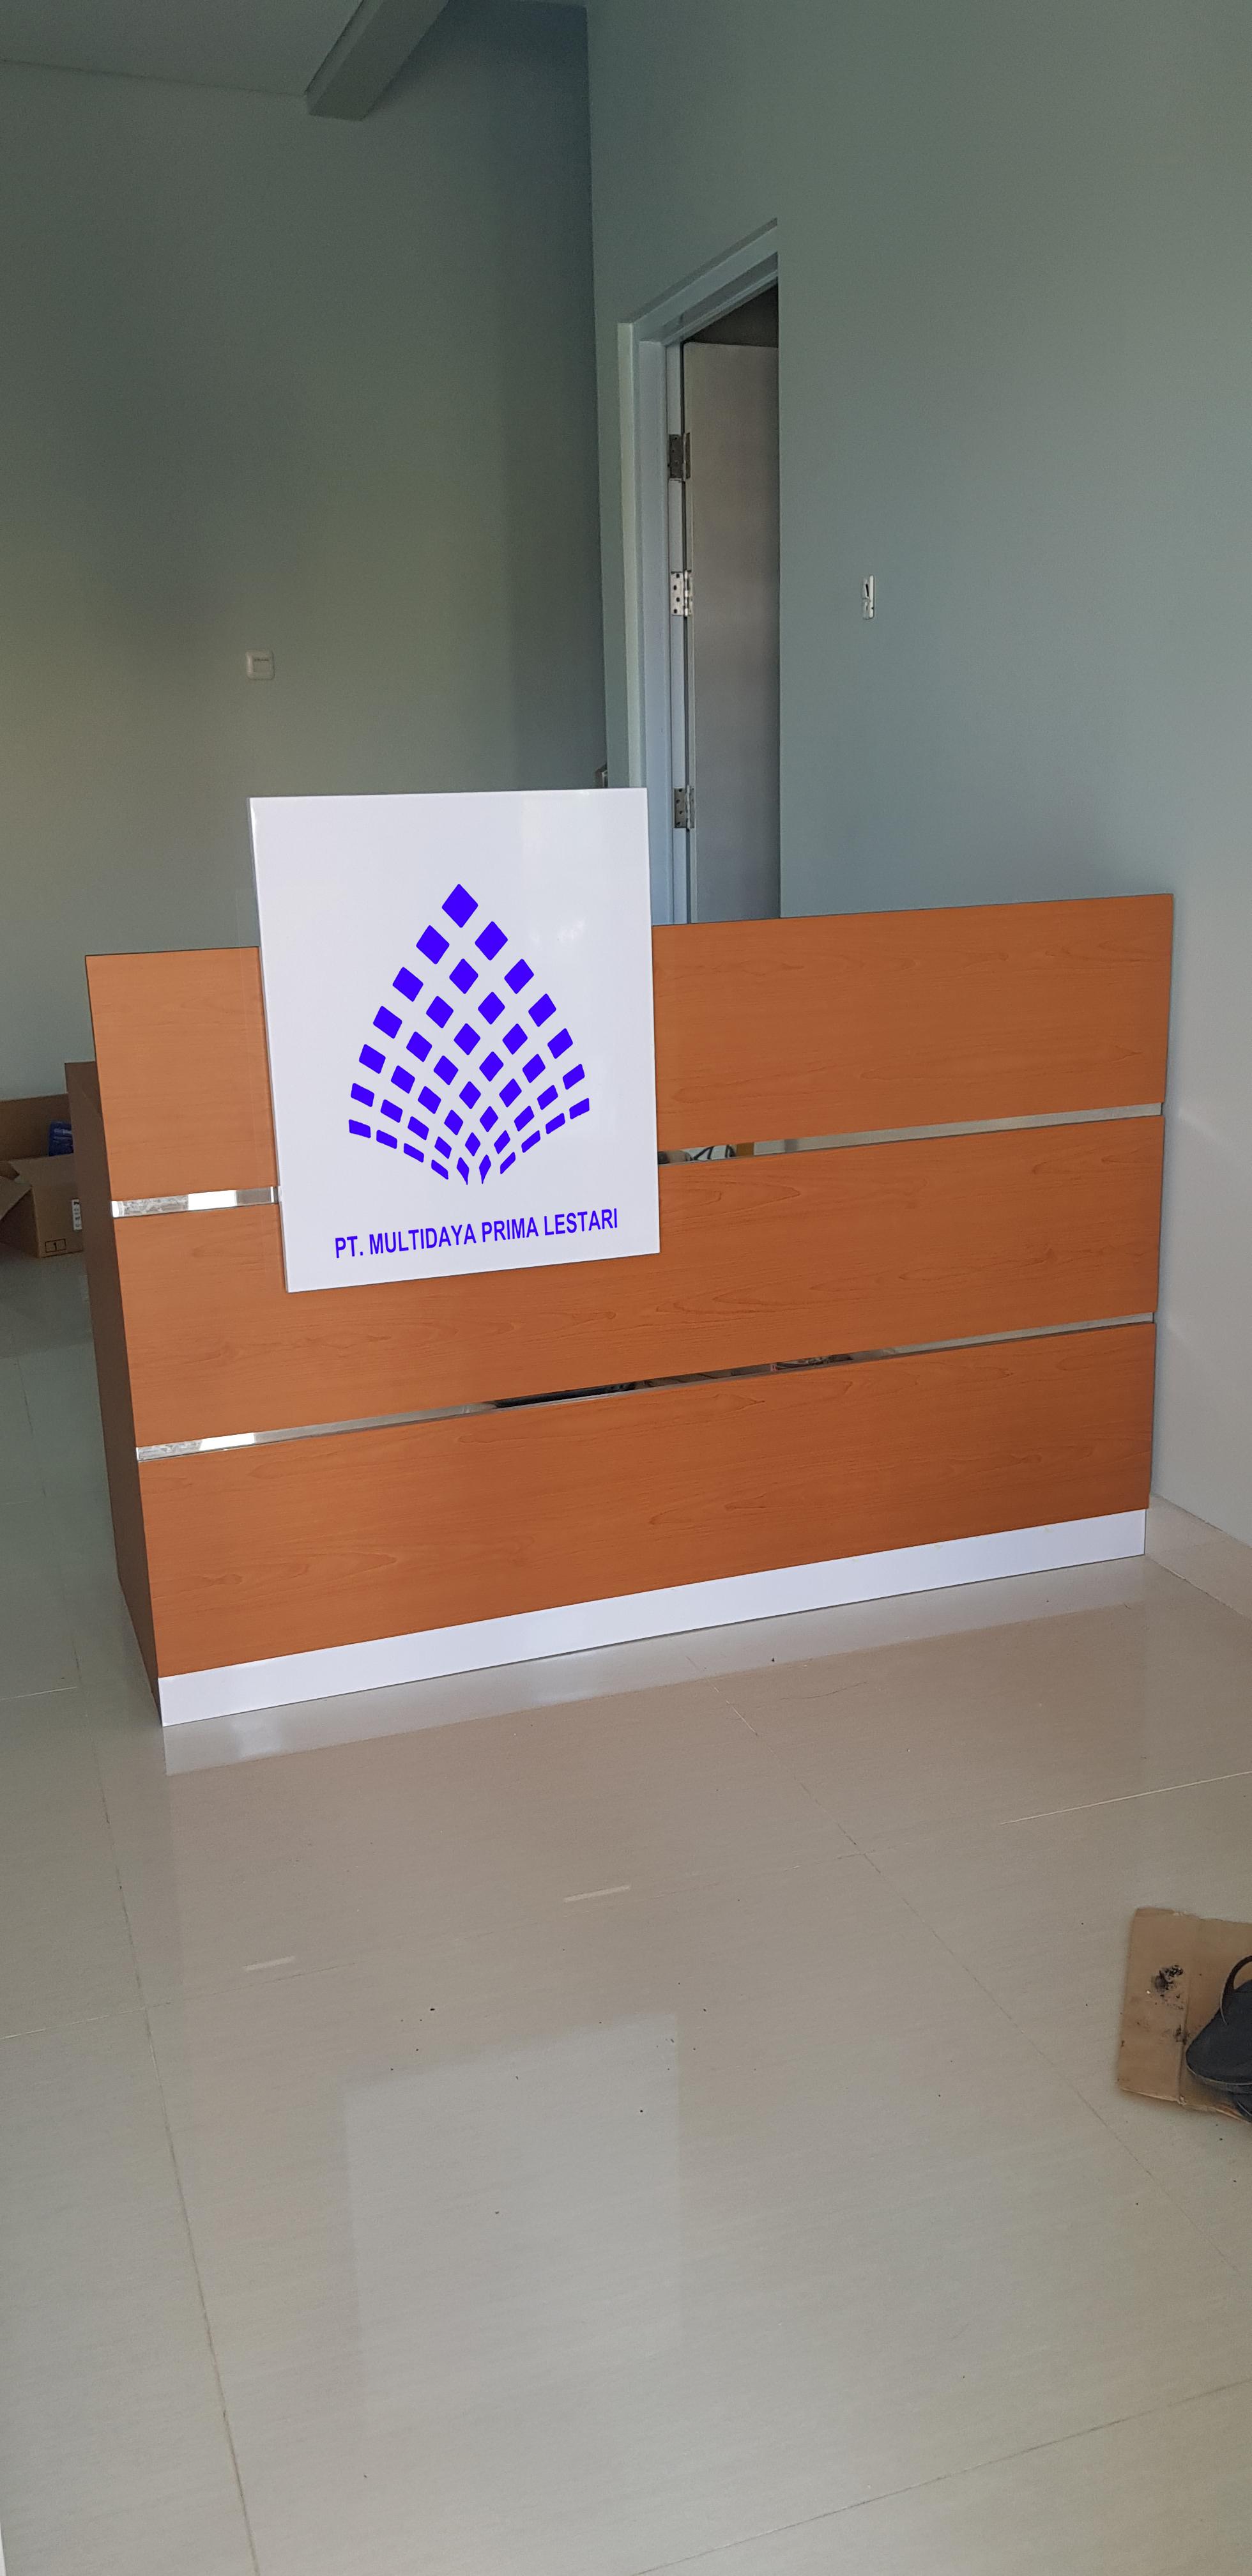 Company PT. Multidaya Prima Lestari